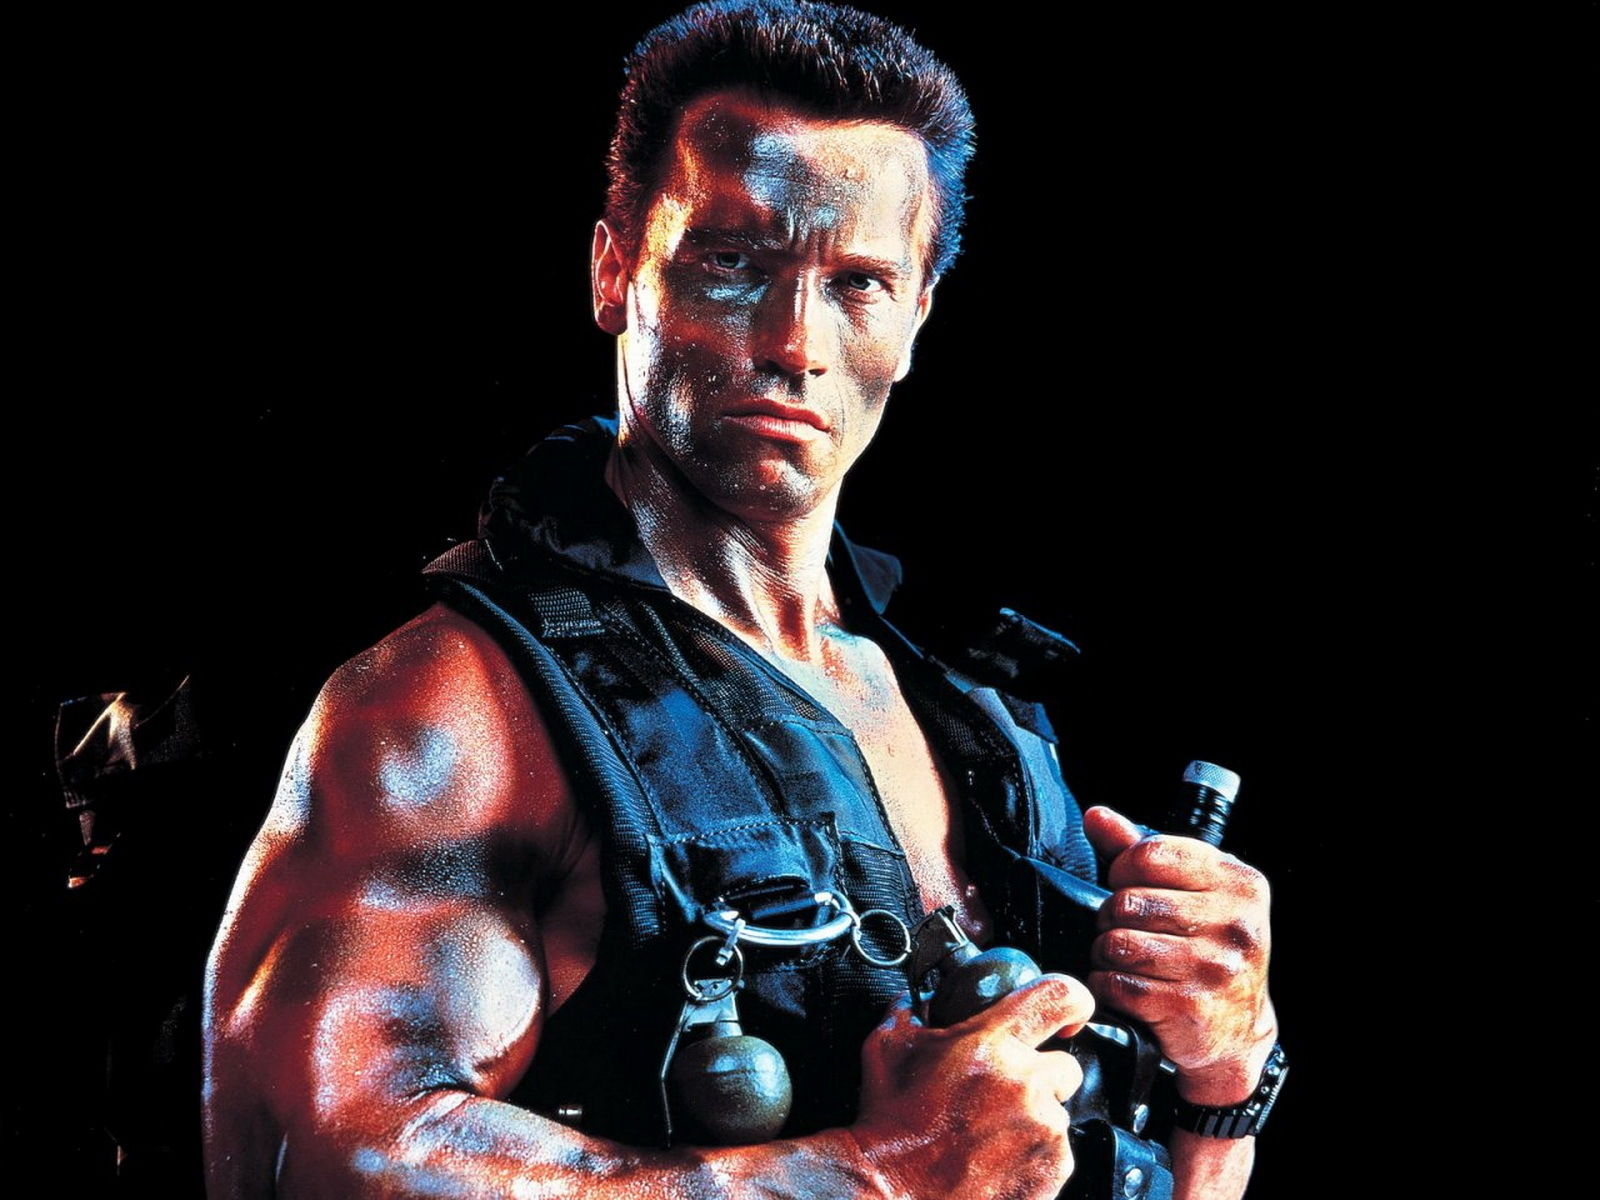 Beautiful Quotes And Inspirational Wallpapers Hd Arnold Schwarzenegger Hd Wallpaper Pixelstalk Net